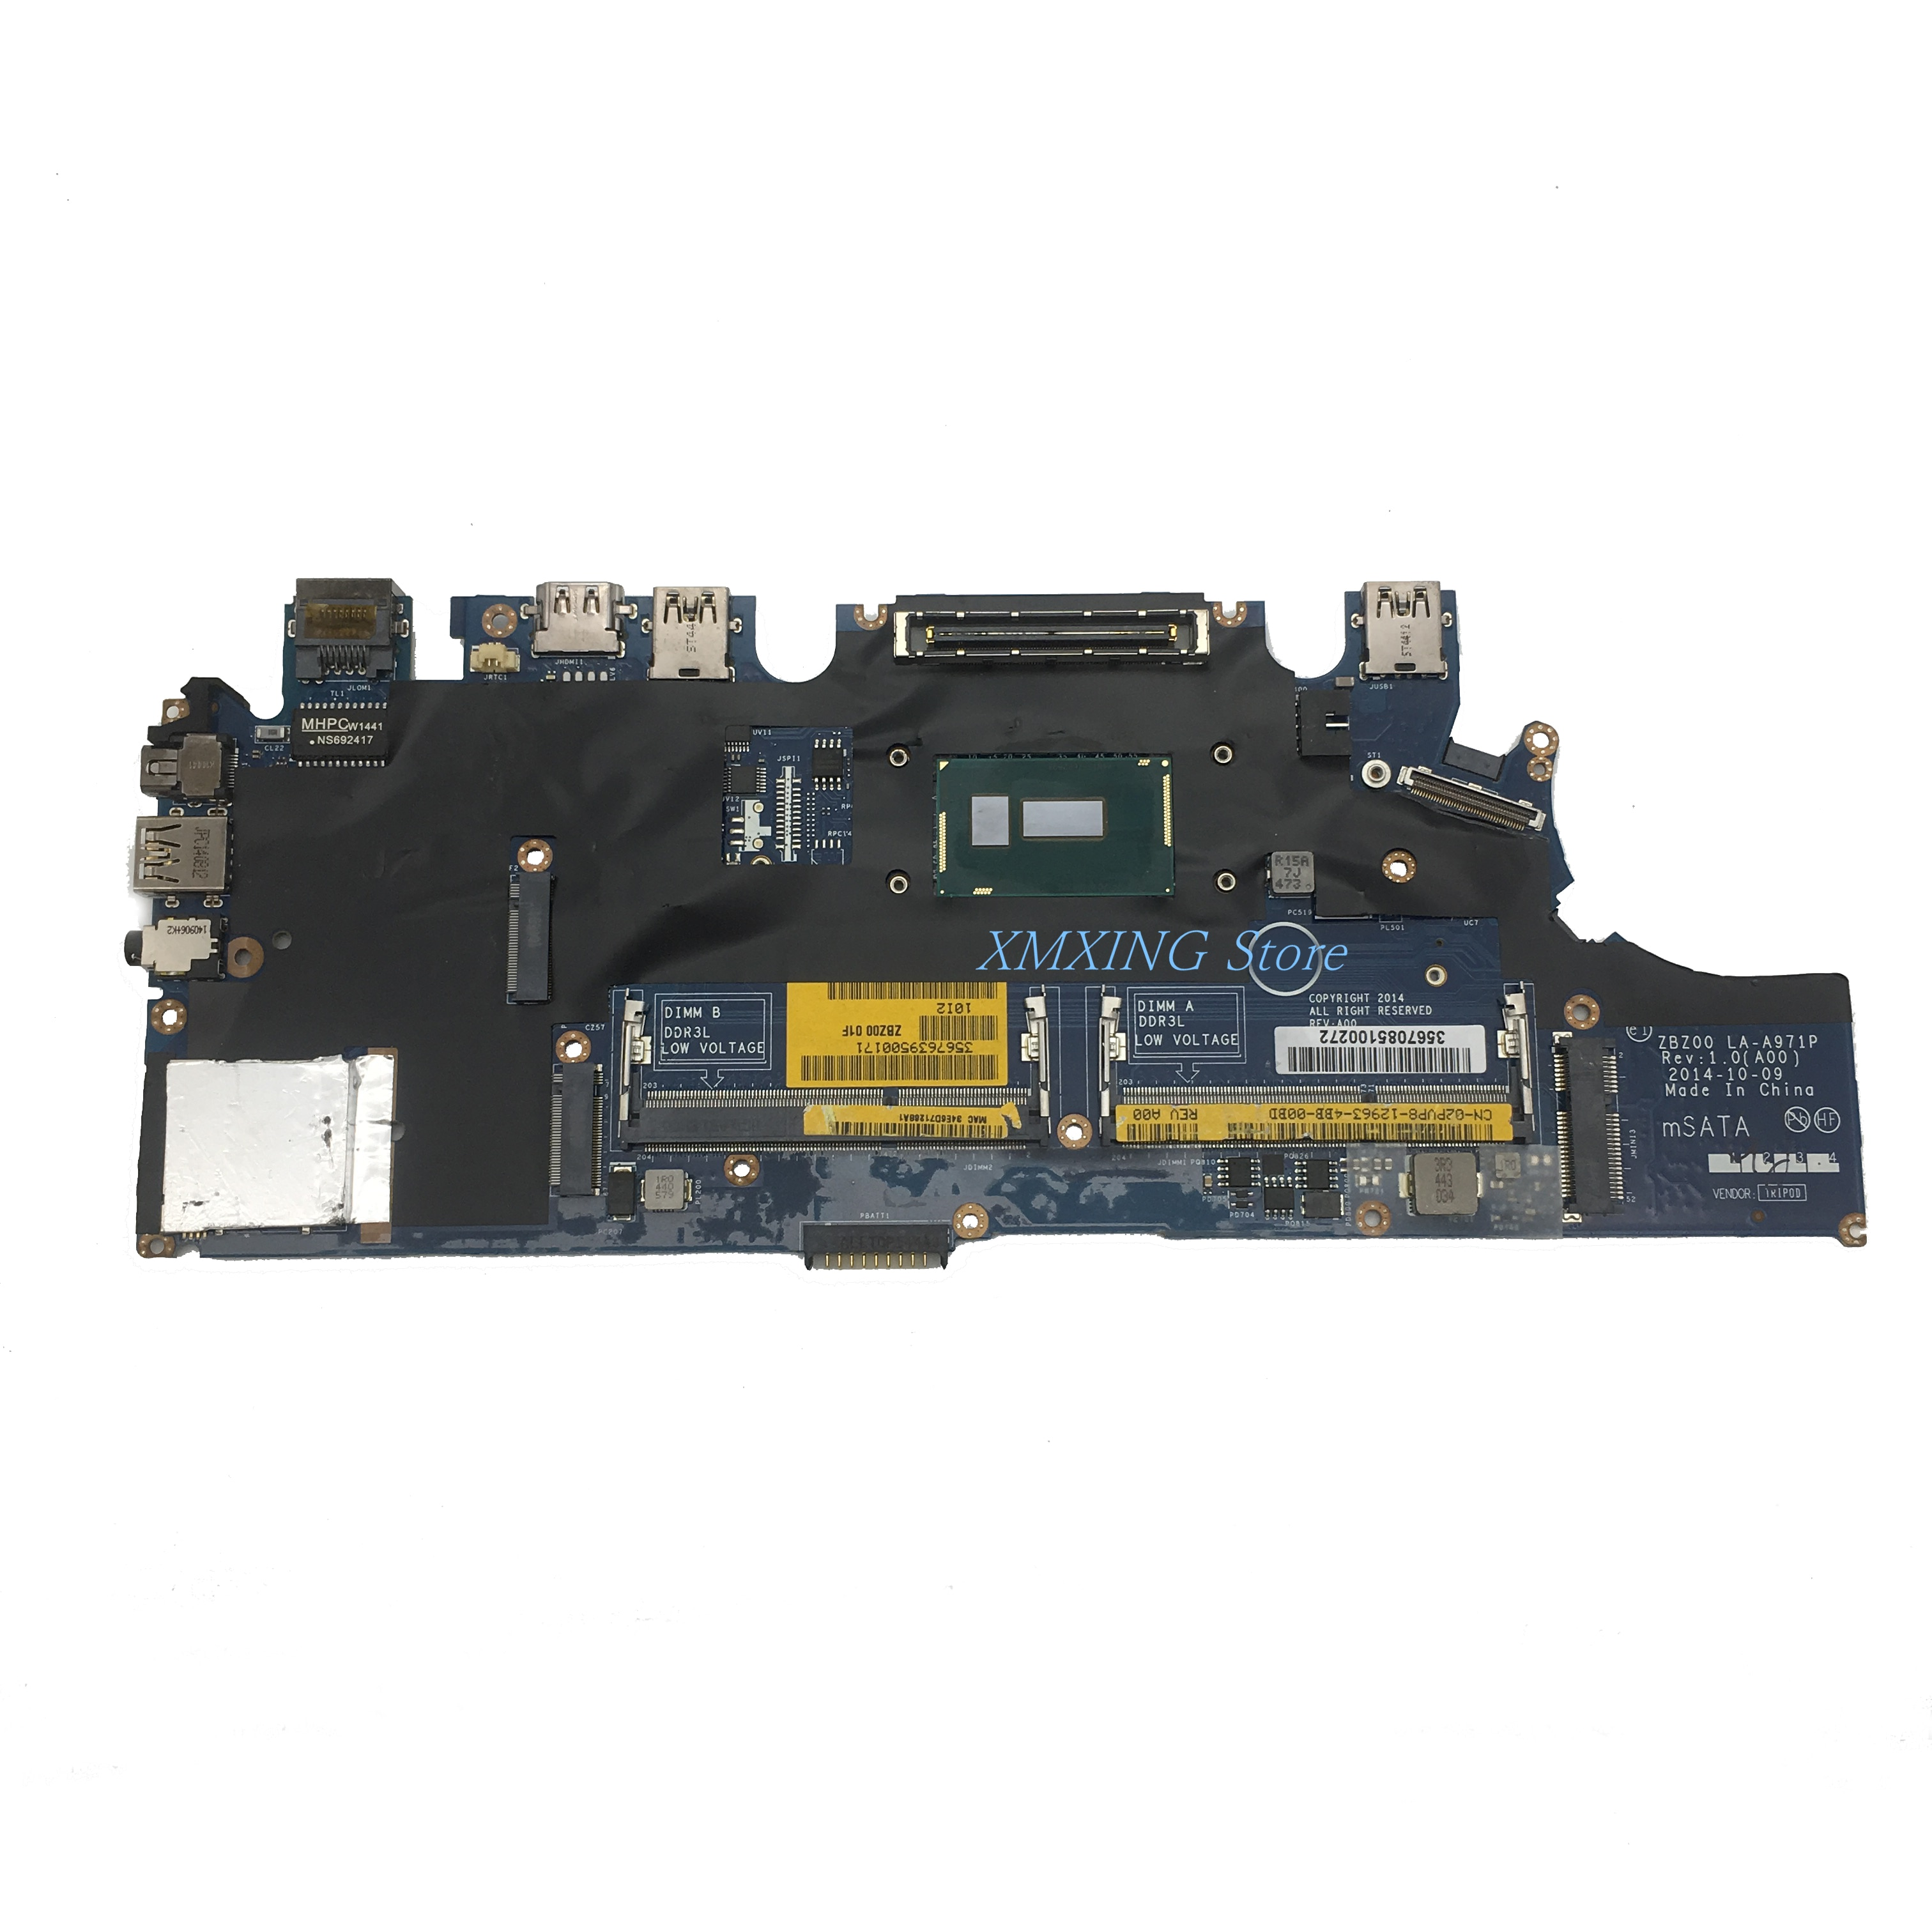 FULCOL لديل خط العرض E7250 اللوحة المحمول I3-5010U CPU LA-A971P ZBZ00 CN-02PVP8 02PVP8 2PVP8 اختبار 100% العمل